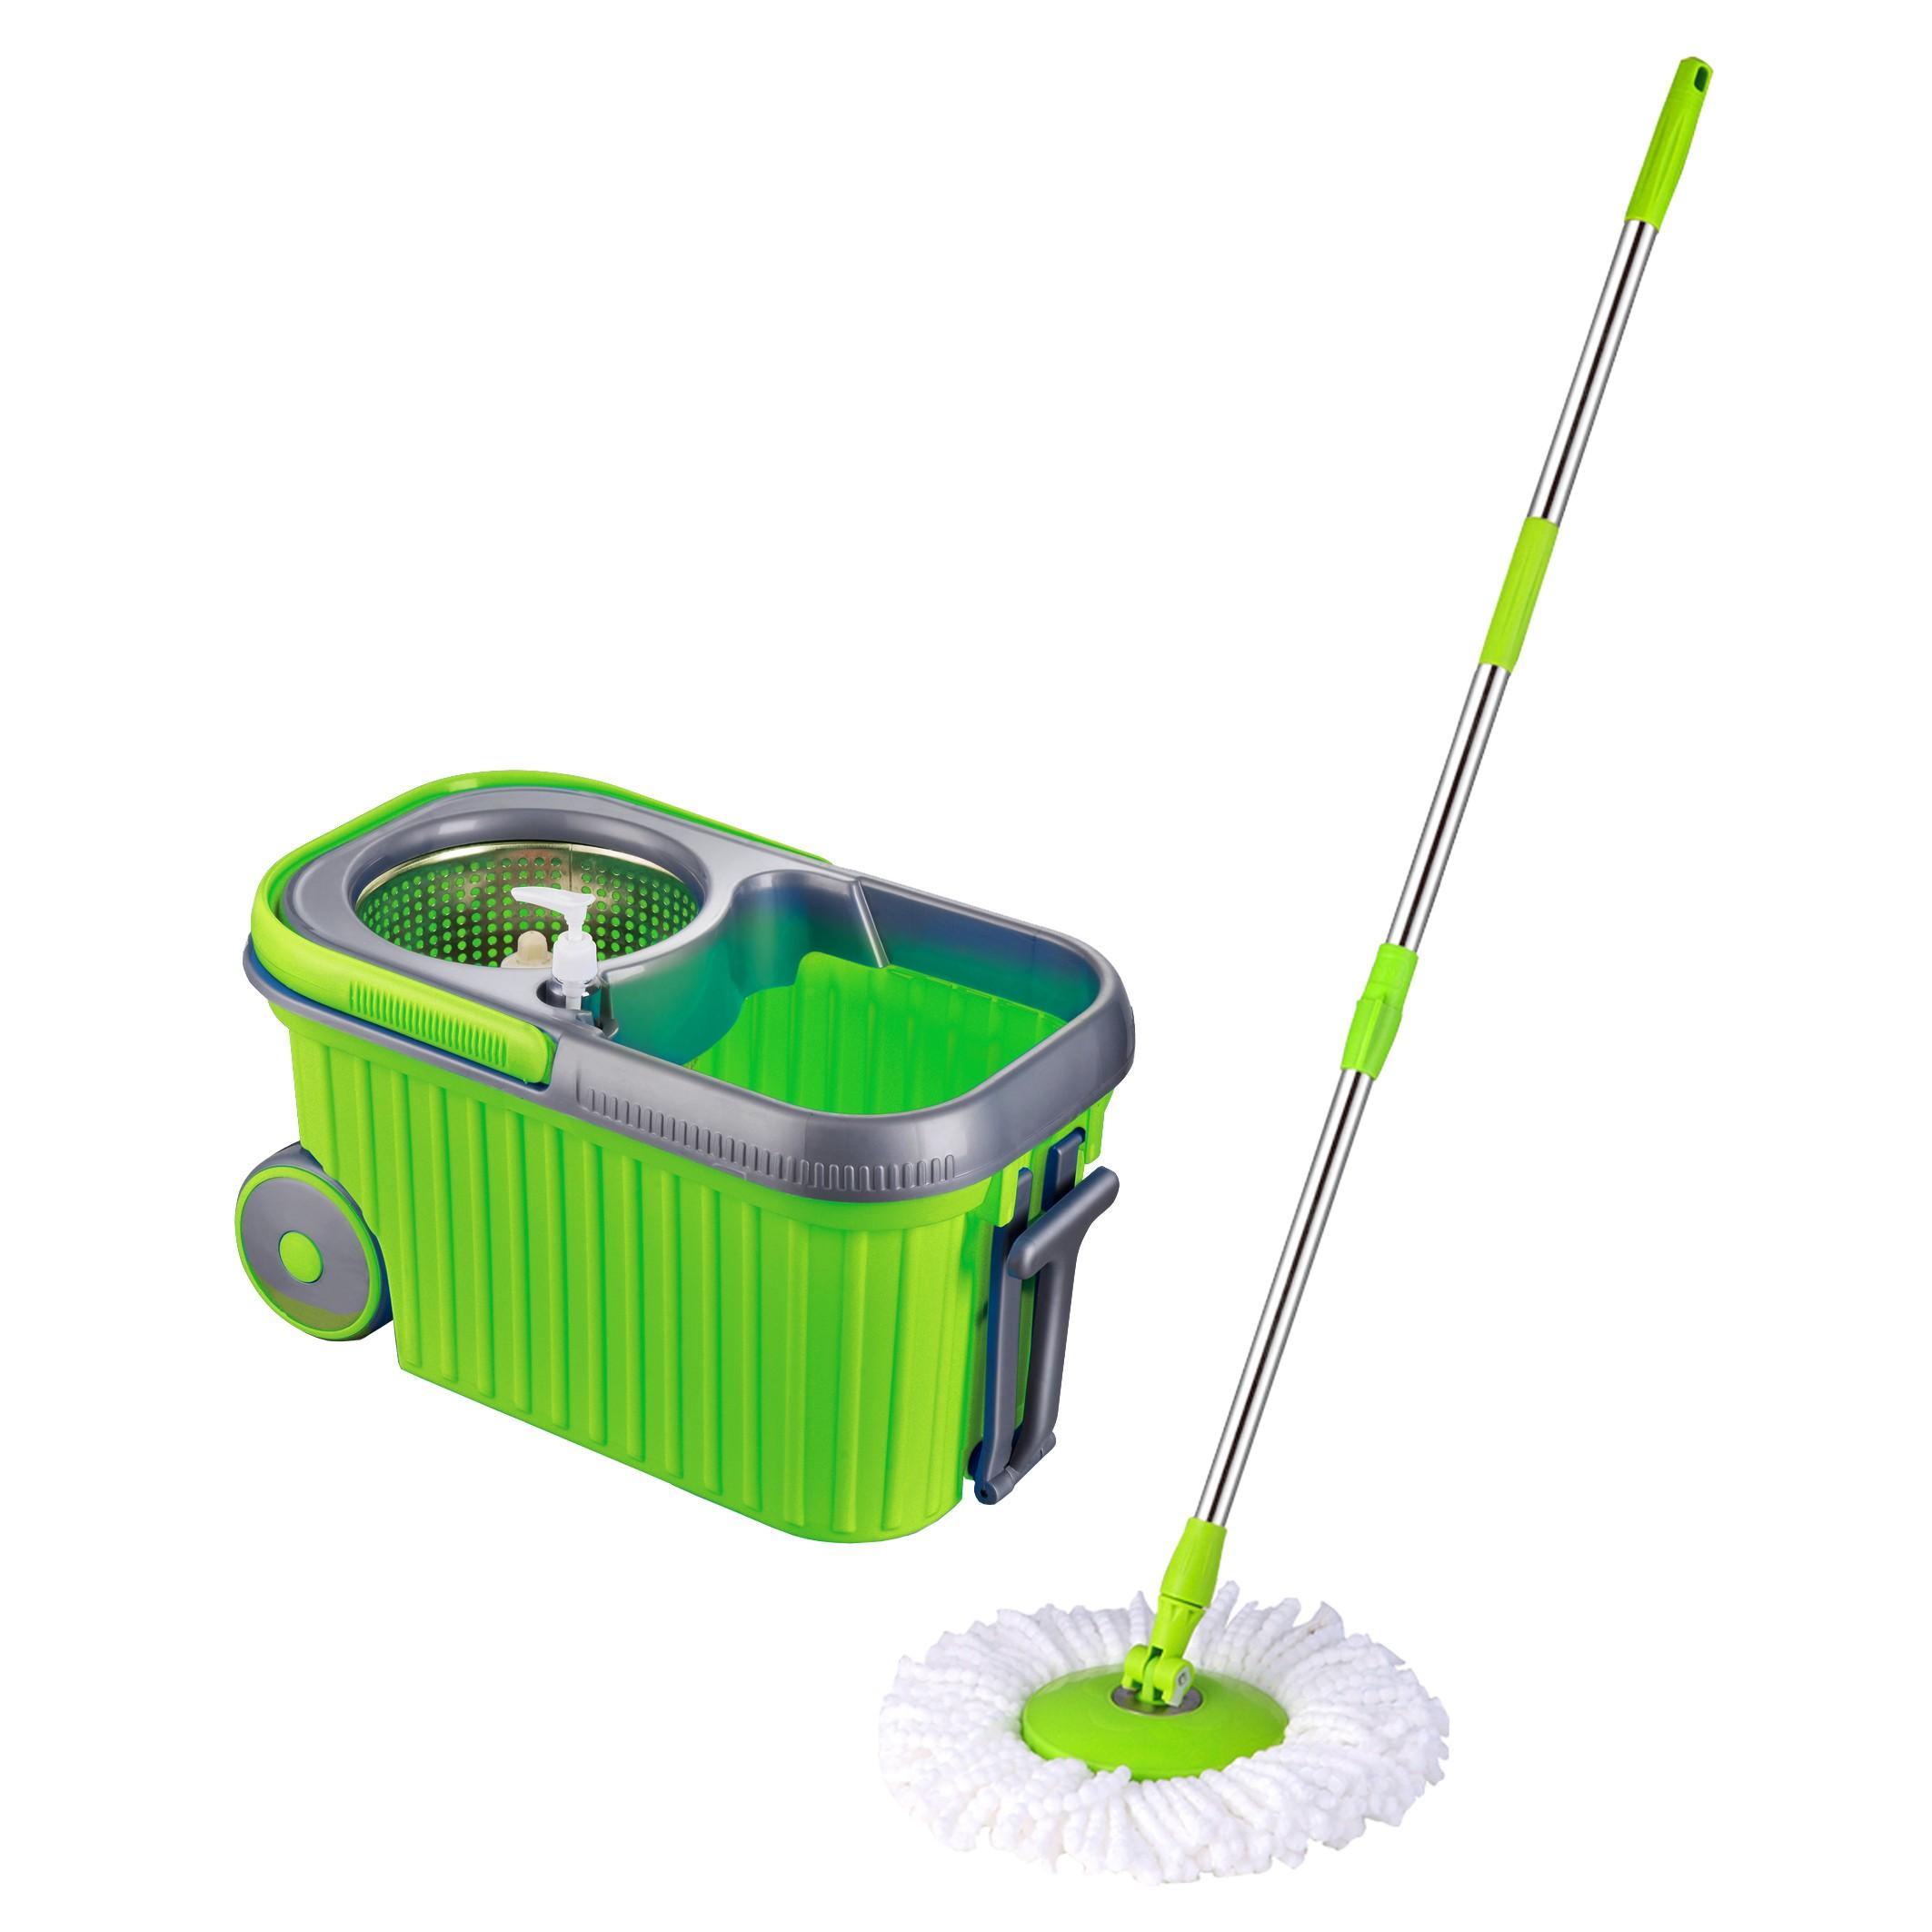 Stainless Steel Mop : Easy Mop Microfiber Spin Mop Wheels Pail & Stainless Steel Basket ...